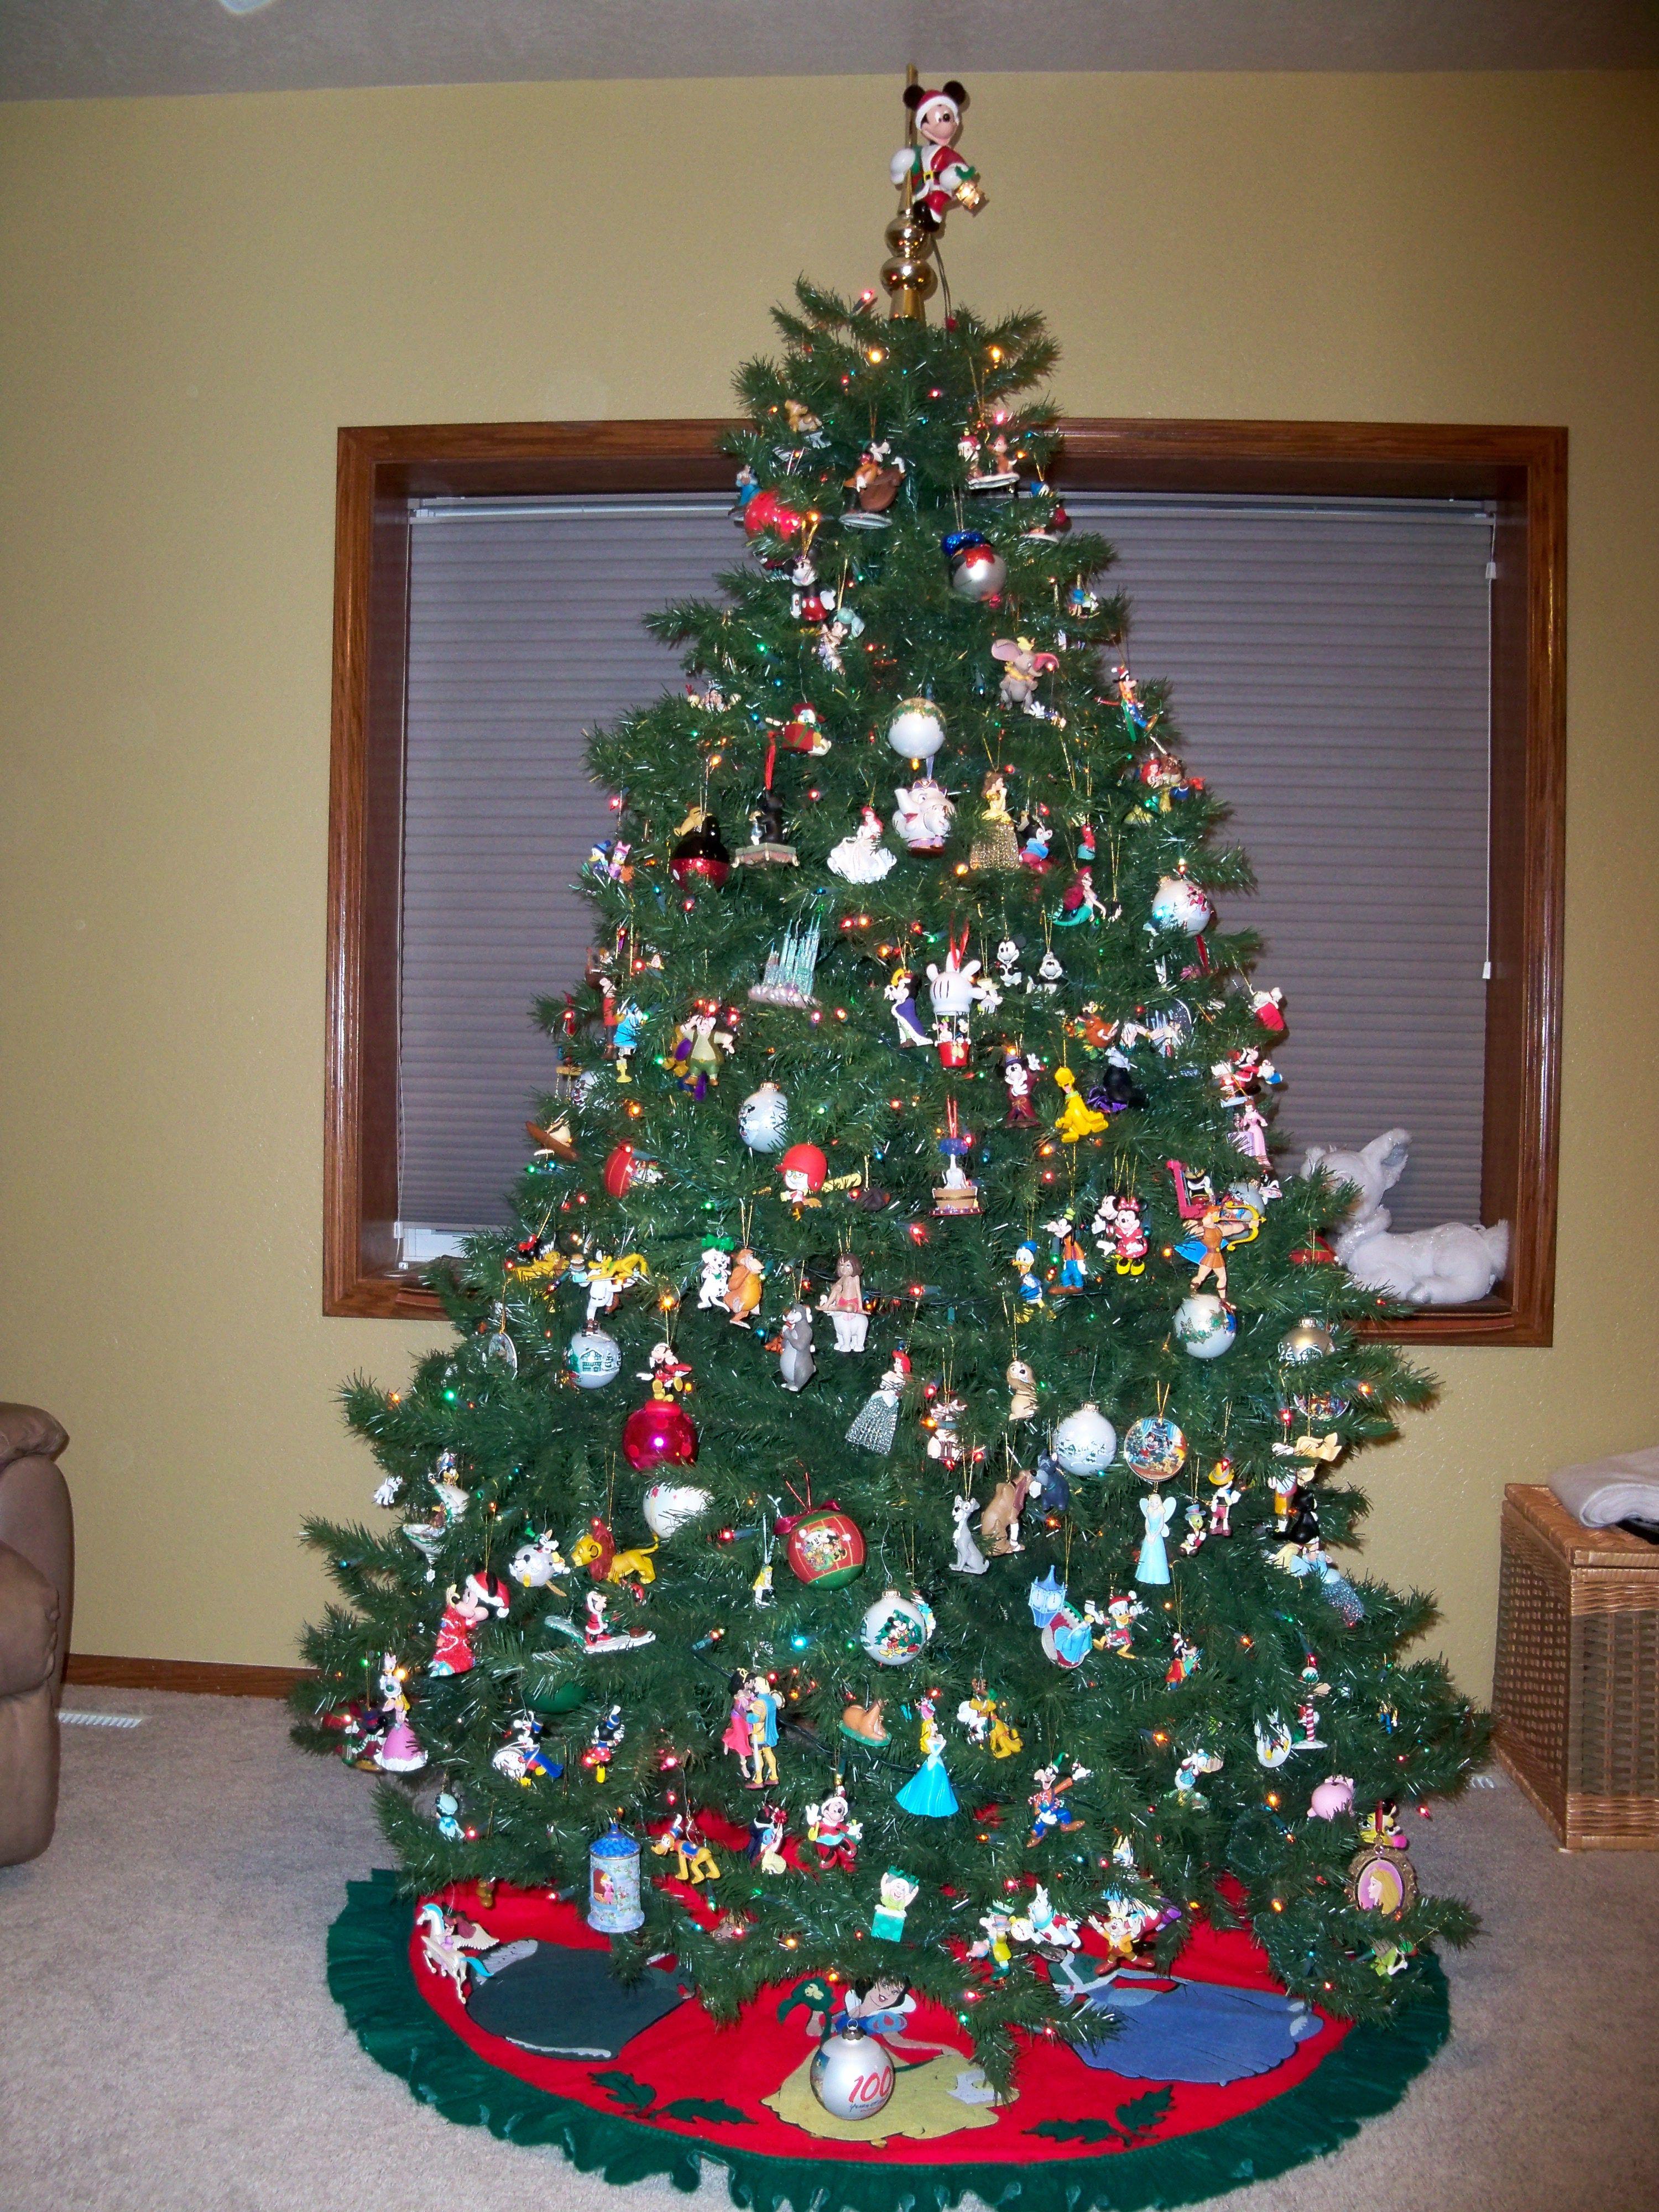 Disney Disney Christmas Tree Disney Christmas Tree Decorations Christmas Tree Decorations